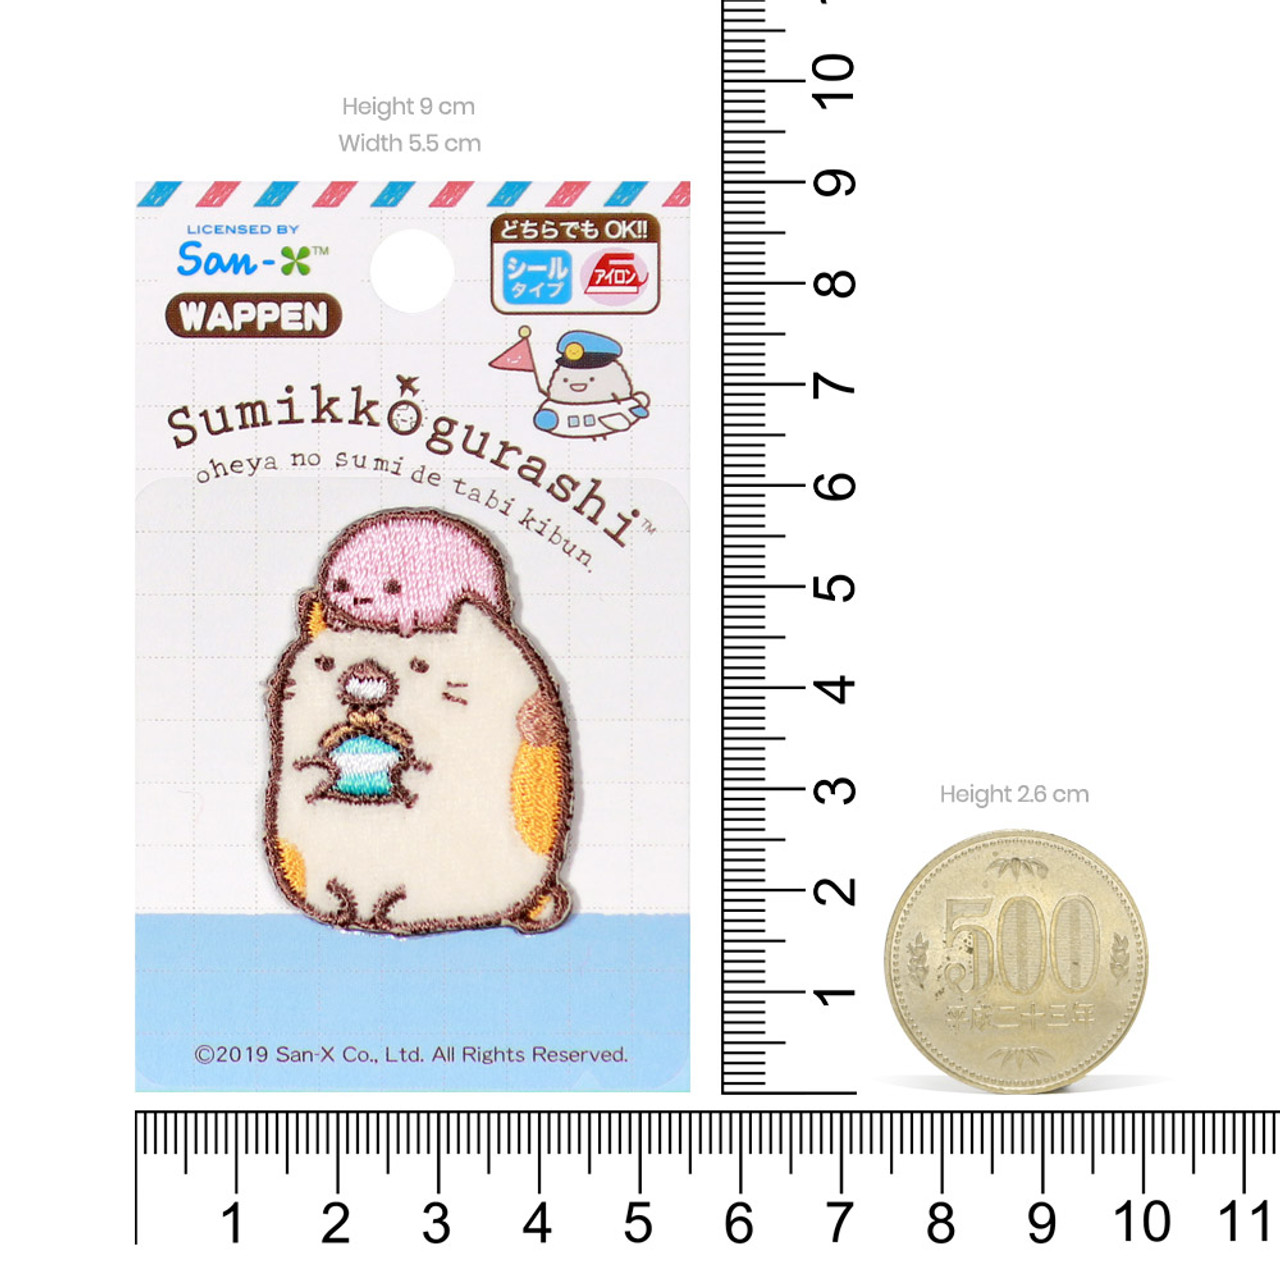 Sumikko Gurashi Iron On Patch Neko Cat Shopping PSU109 ( Proportion )